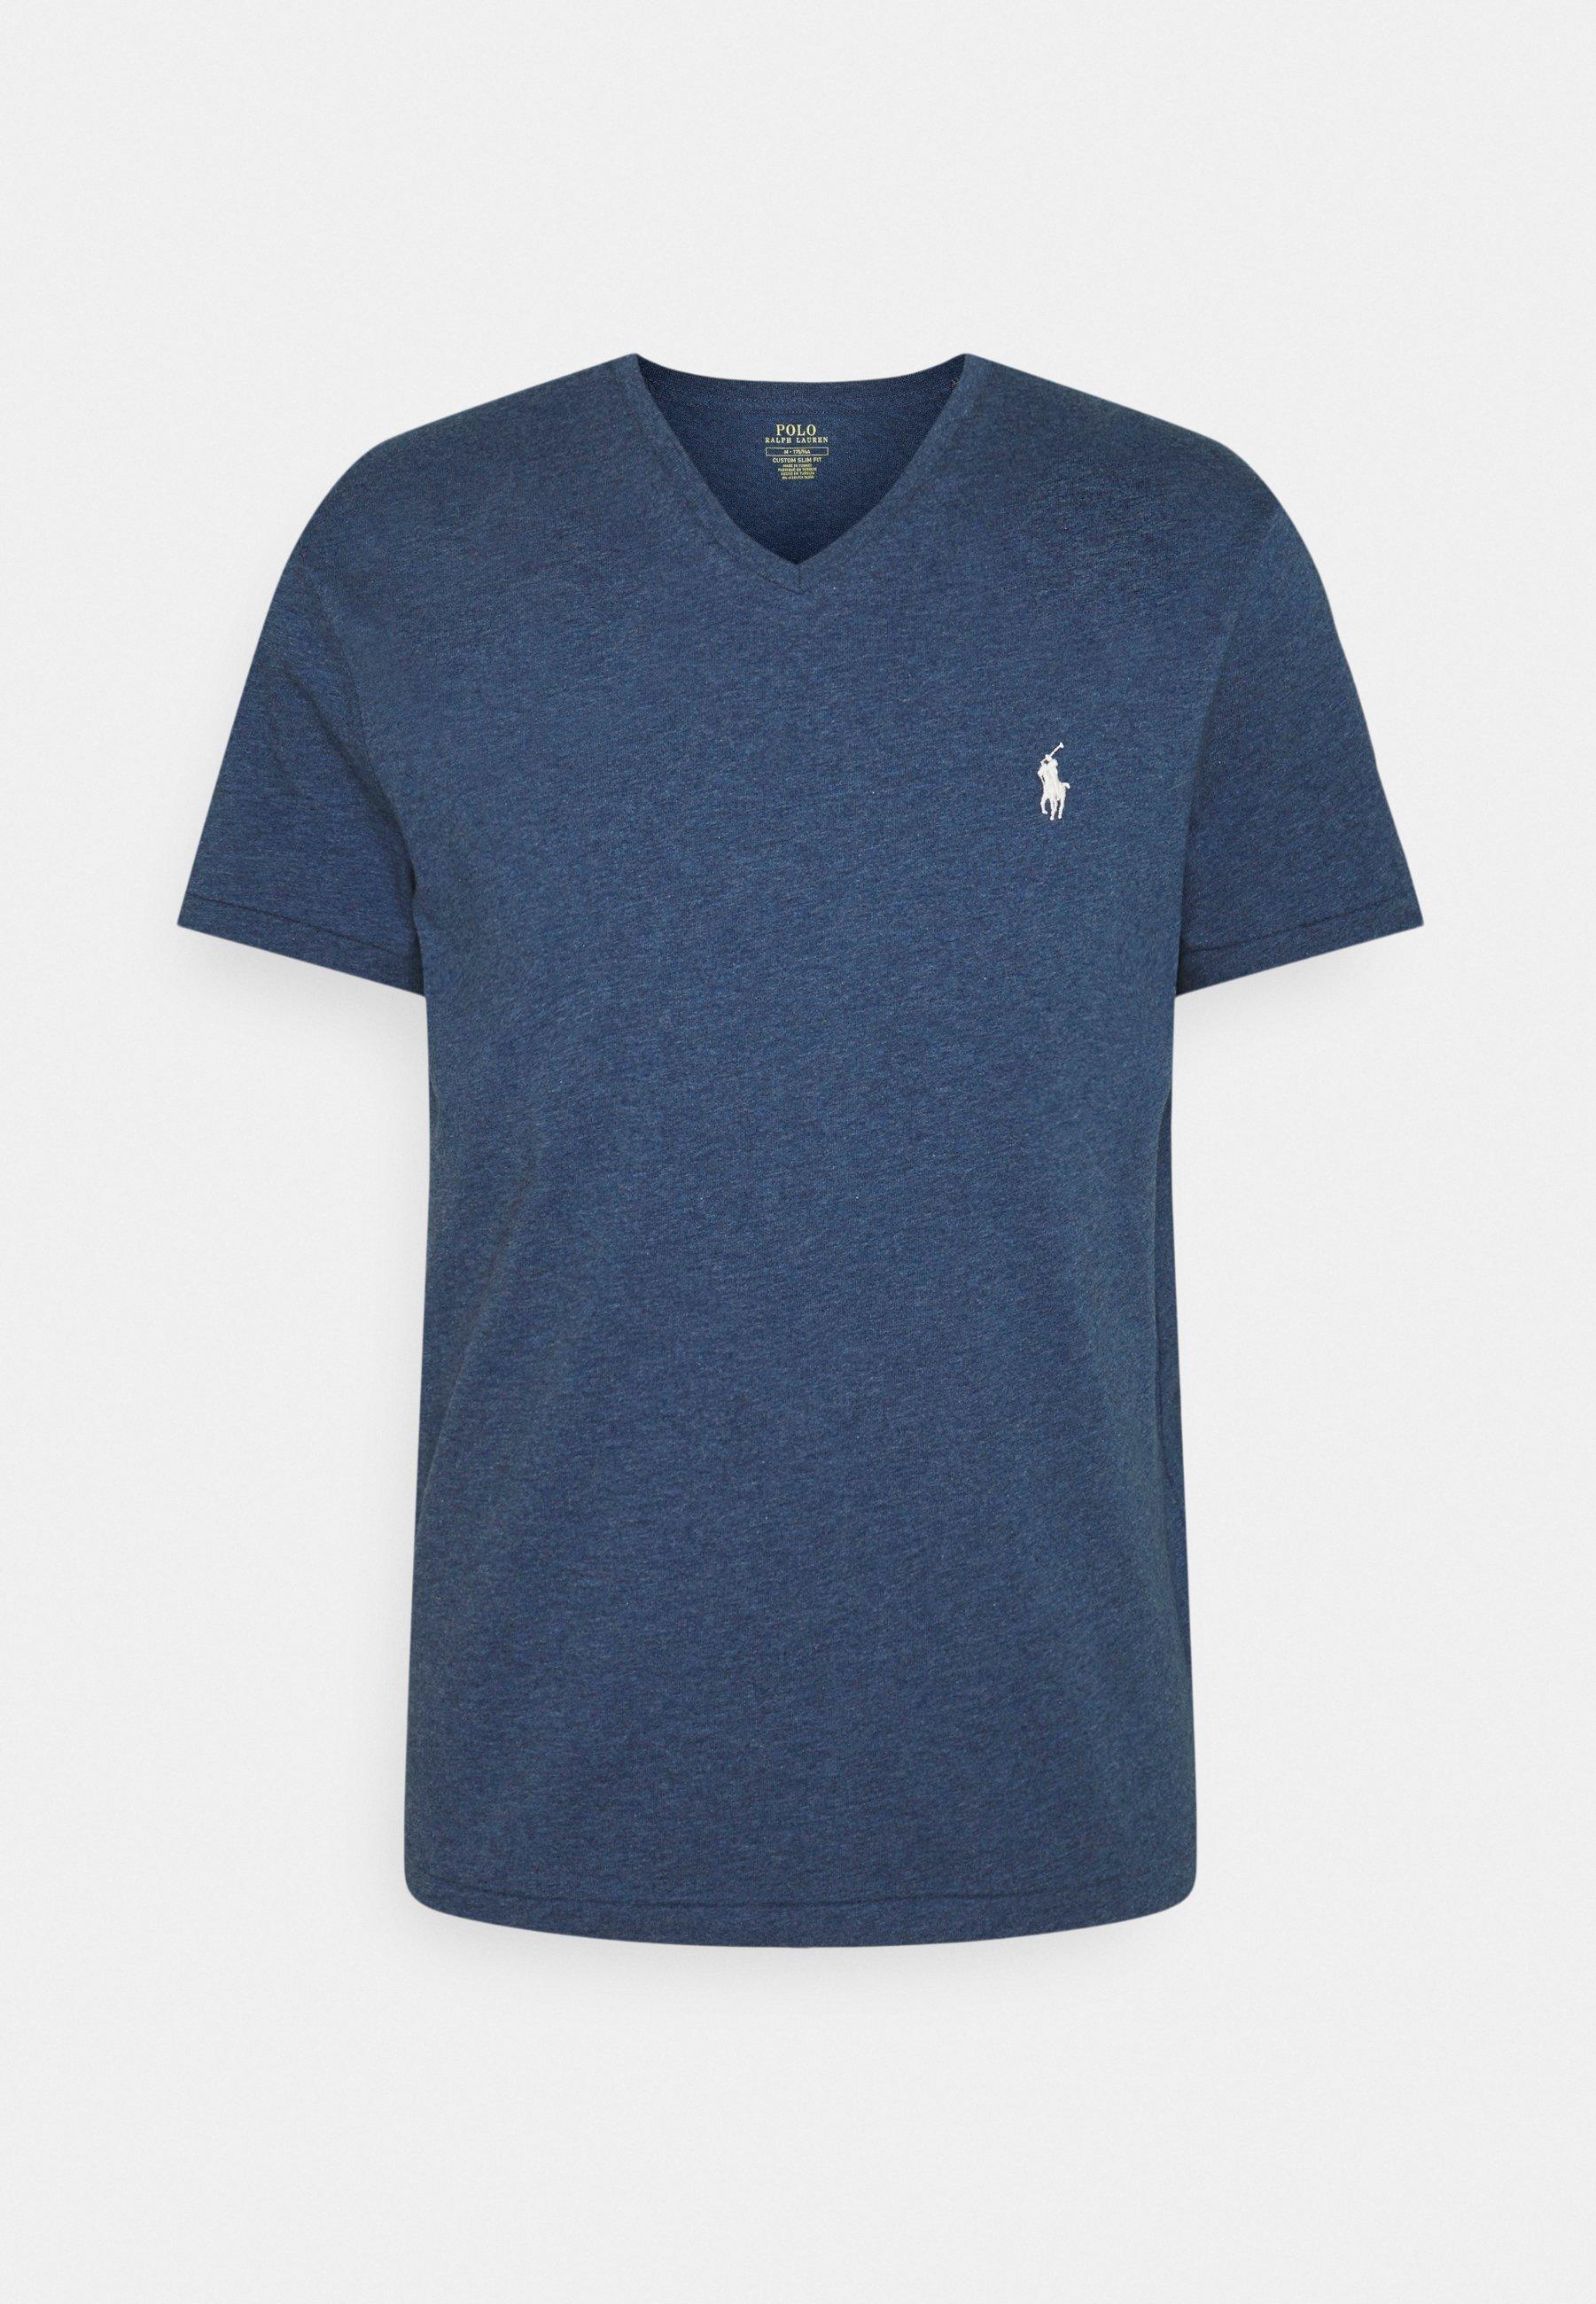 Herrer CUSTOM SLIM FIT JERSEY V-NECK T-SHIRT - T-shirts basic